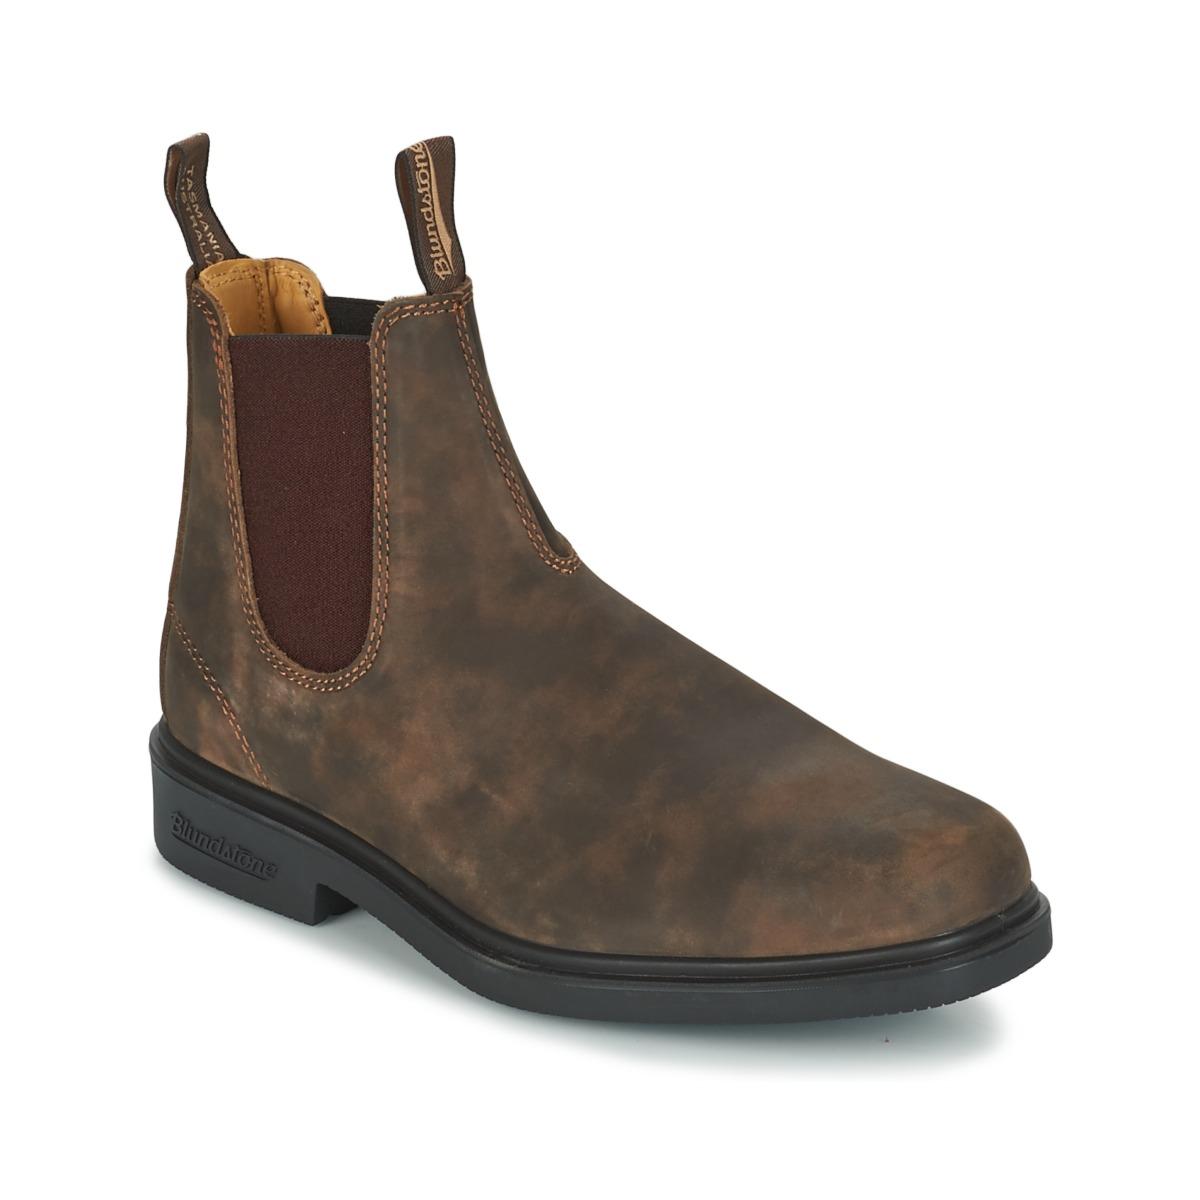 Blundstone COMFORT DRESS BOOT Braun - Kostenloser Versand bei Spartoode ! - Schuhe Boots  185,00 €